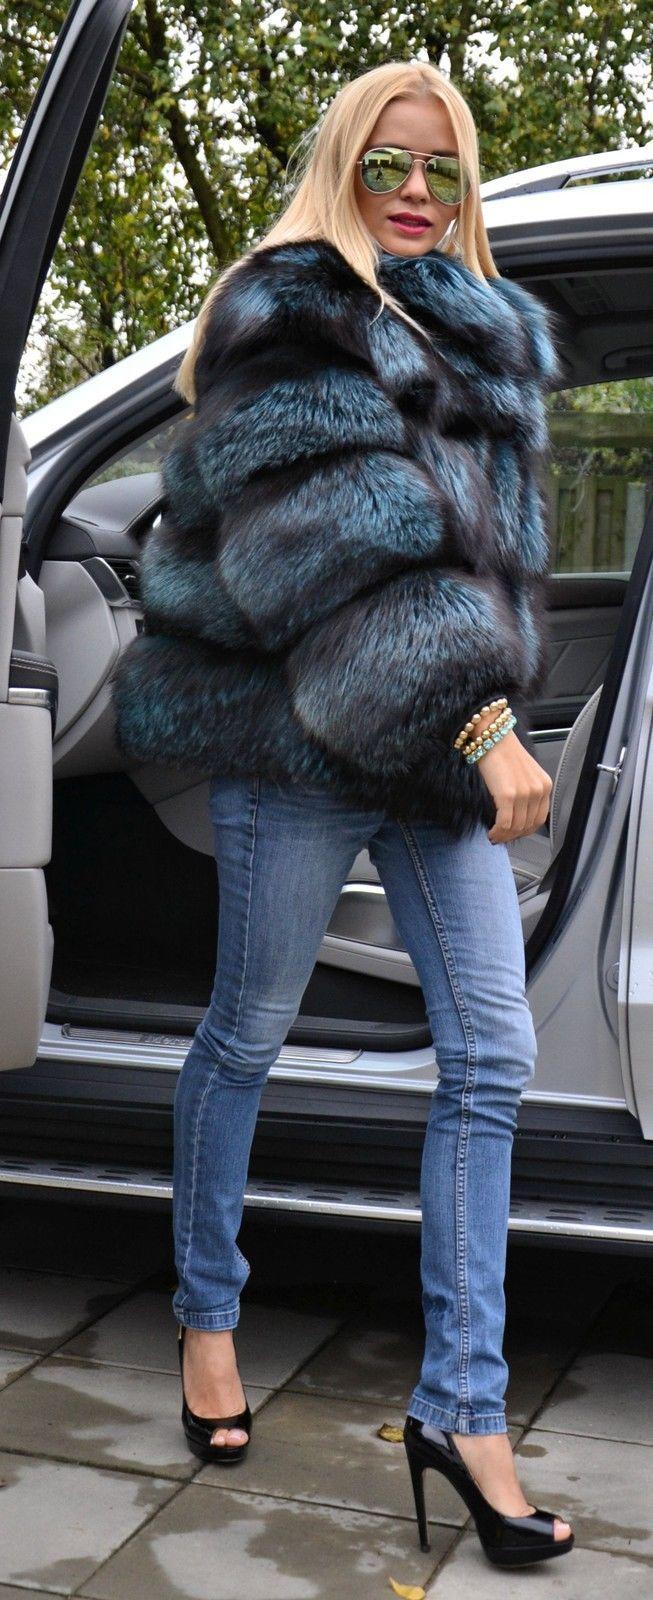 Ocean Blue Royal Saga FOX Silver FUR Coat Jacket Like Sable Mink Chinchilla Lynx | eBay